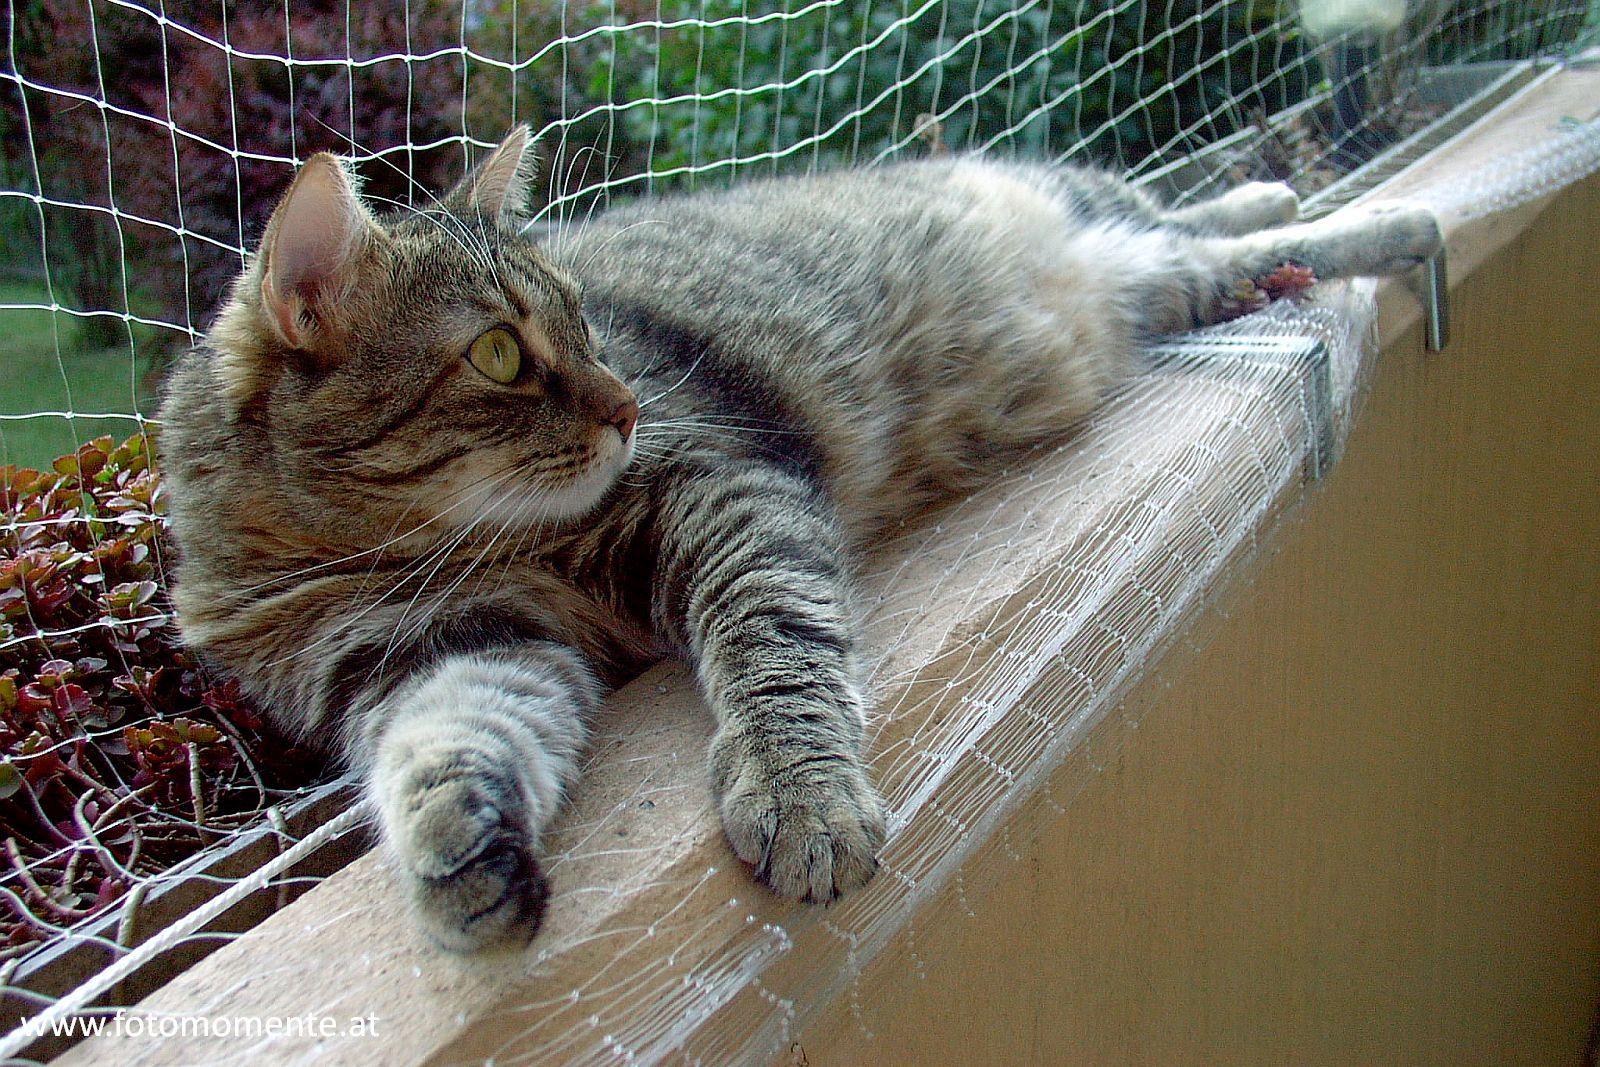 hauskatze chillen balkon - Hauskatze beim Chillen am Balkon